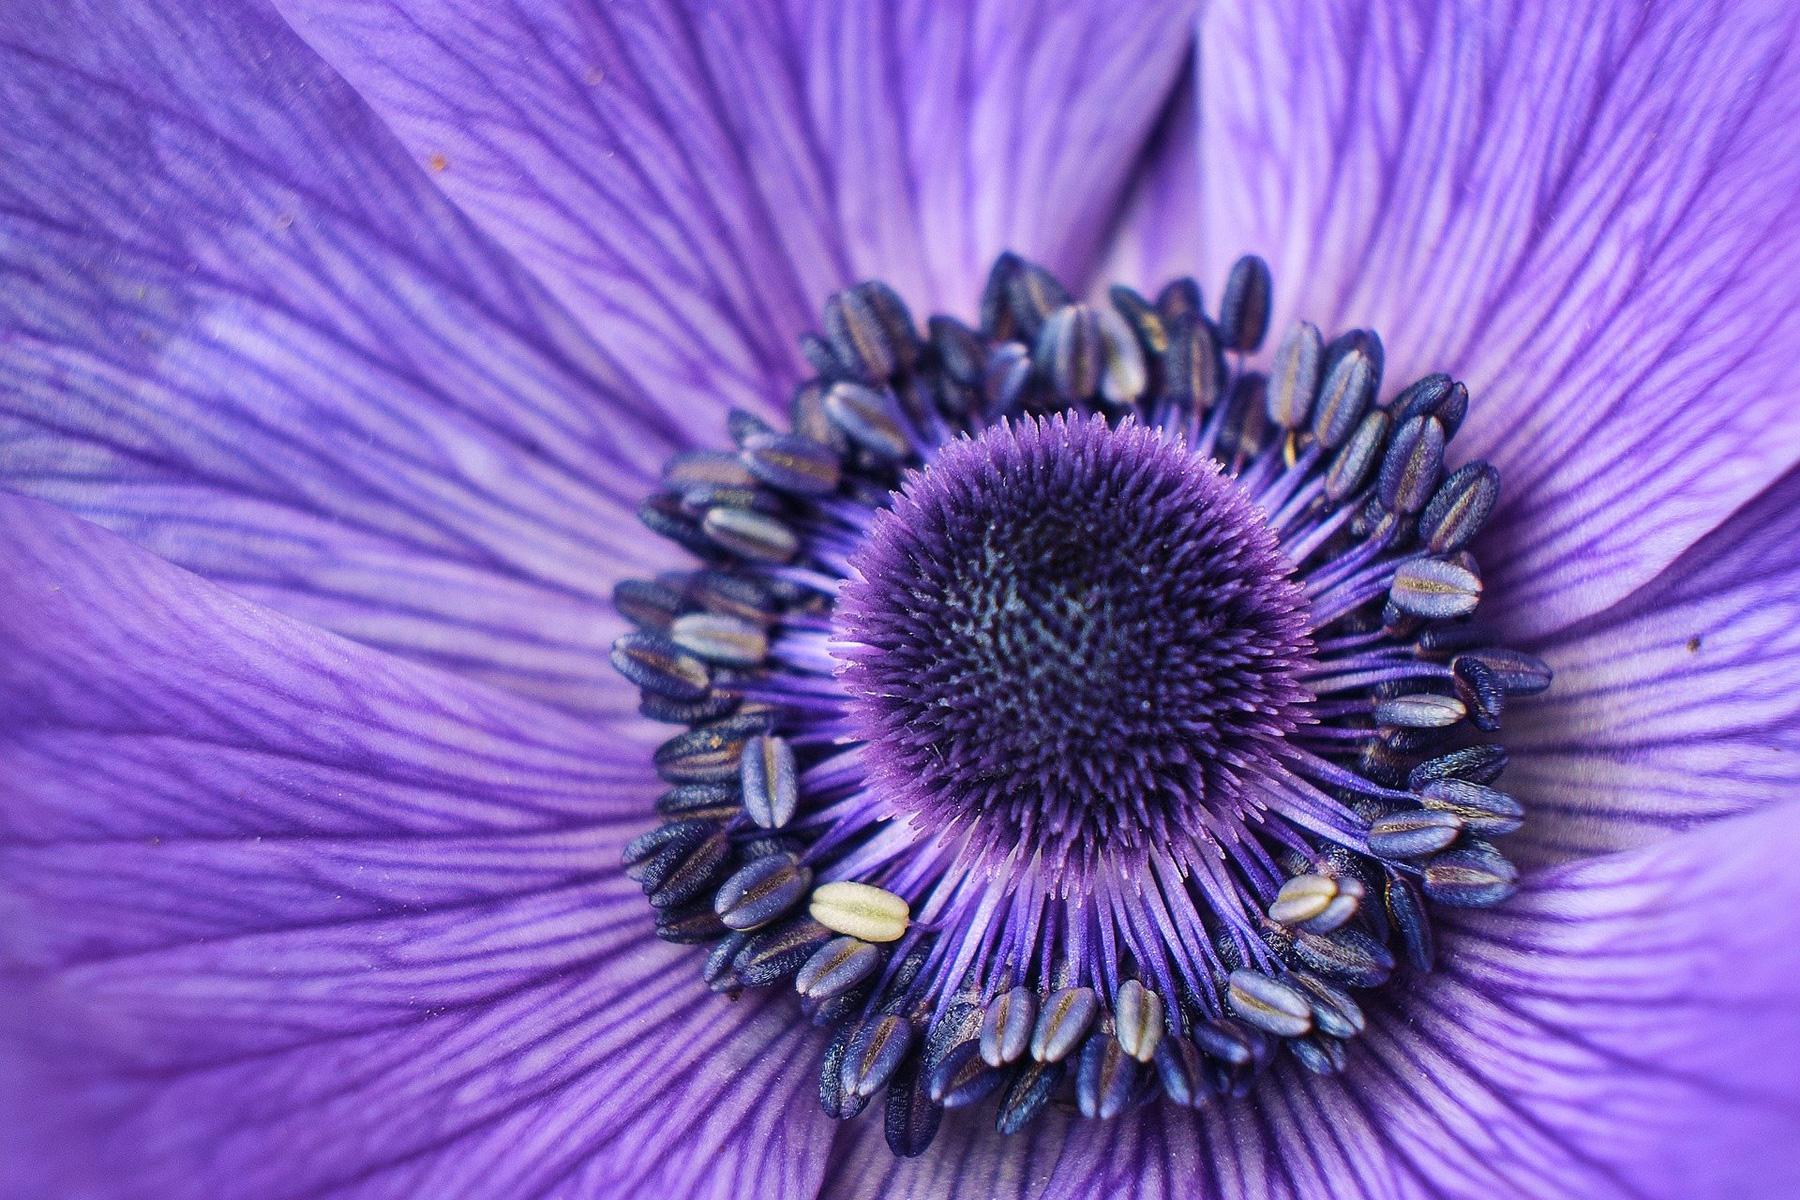 Hintergrundbild Blumenblüte violett